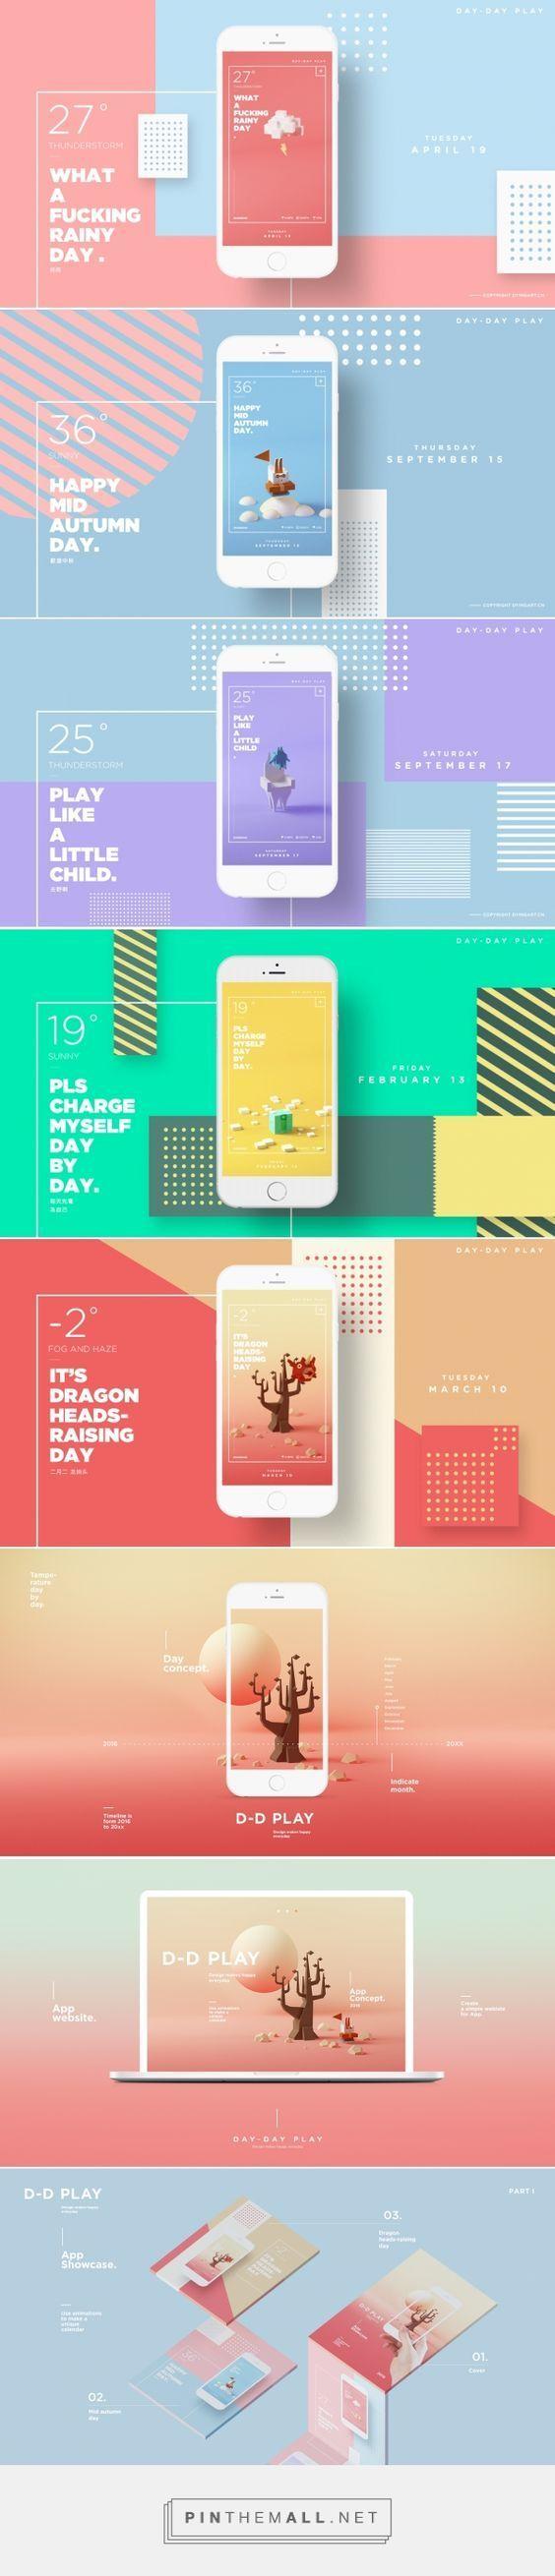 D d play app design abduzeedo design inspiration for New design inspiration